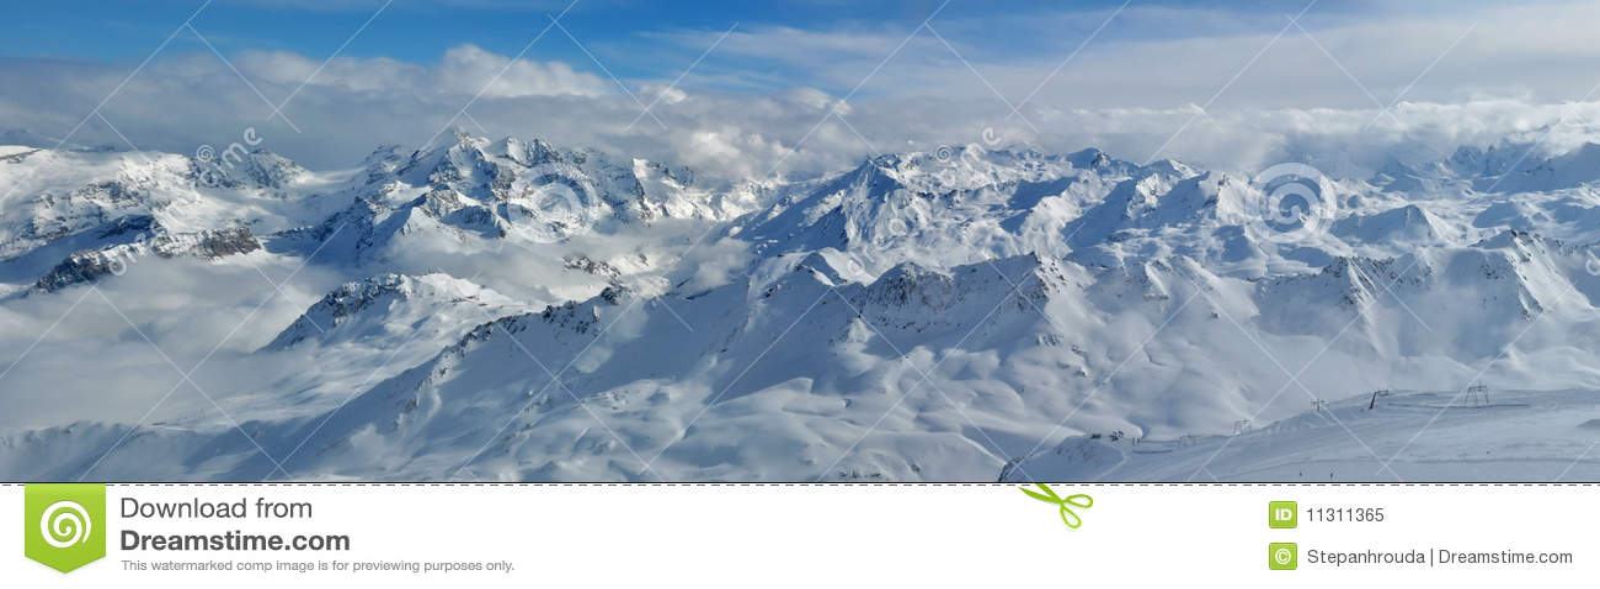 Berge (Alpen) - Panorama